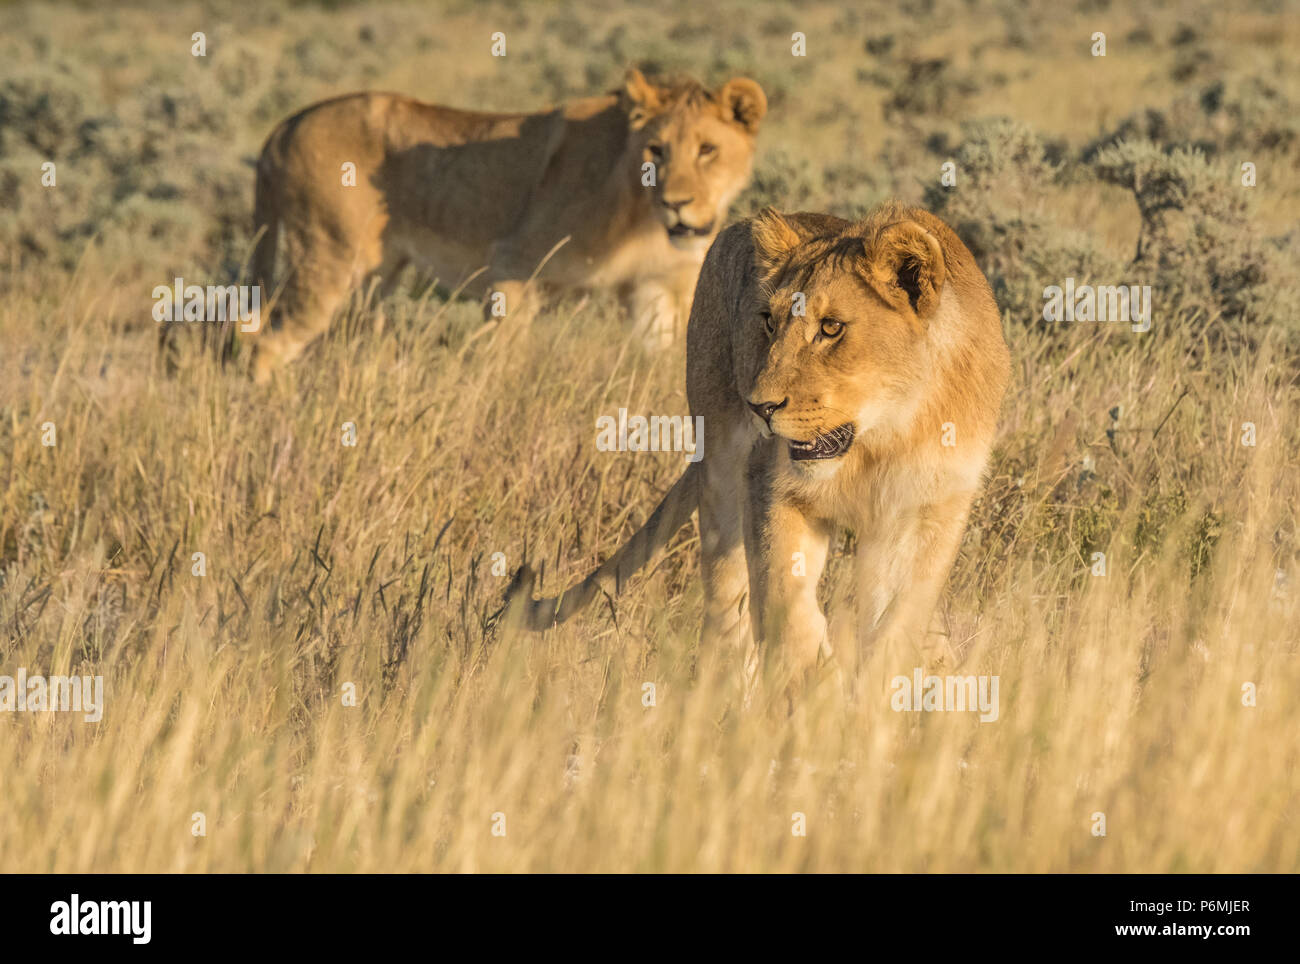 Lions stocking prey, Nebrownii waterhole, Okaukeujo, Etosha National Park, Namibia - Stock Image